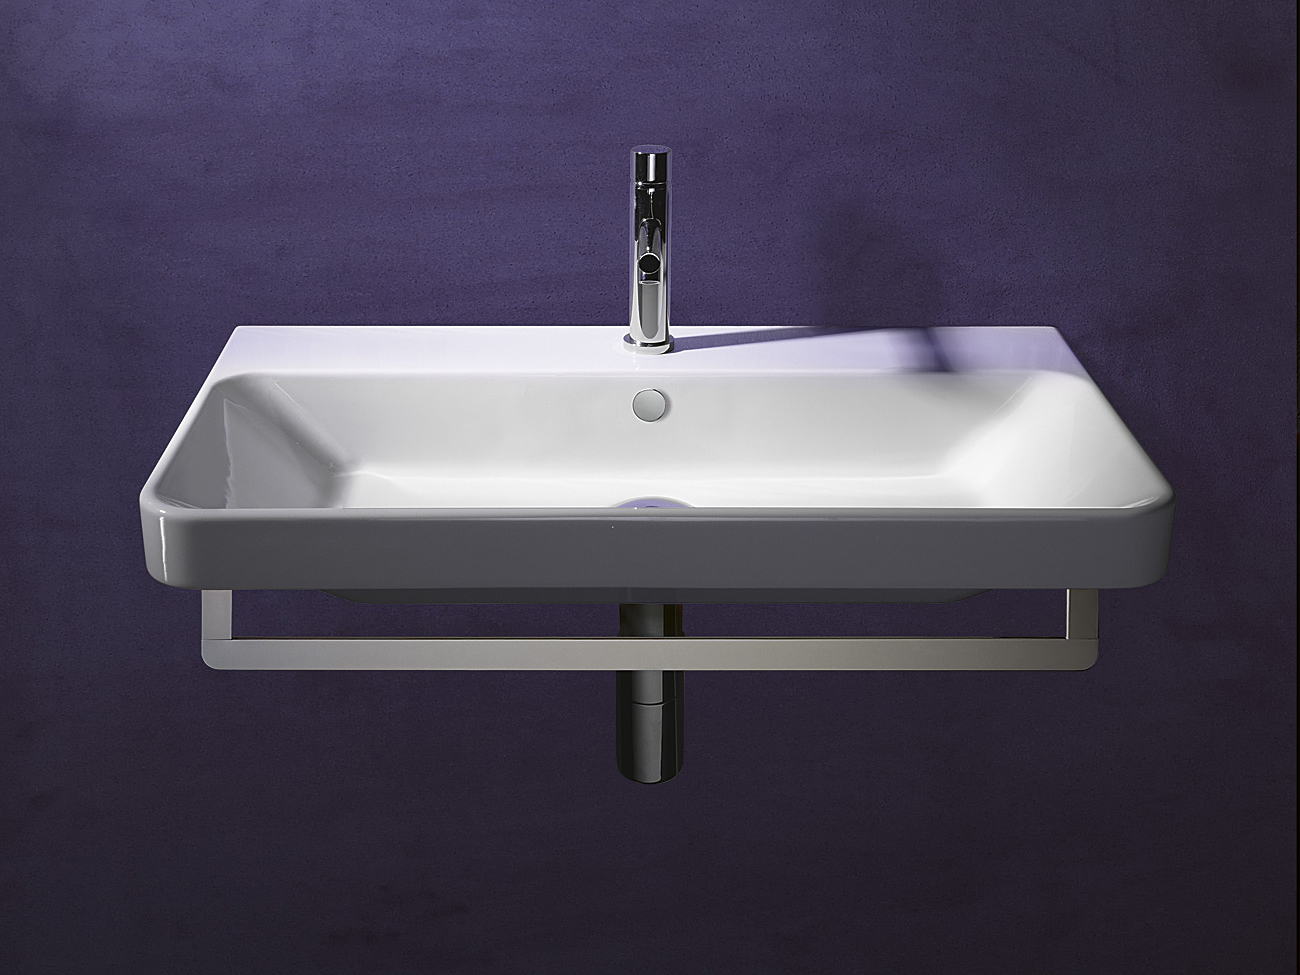 rechteckiges h nge waschbecken aus keramik proiezioni 75. Black Bedroom Furniture Sets. Home Design Ideas